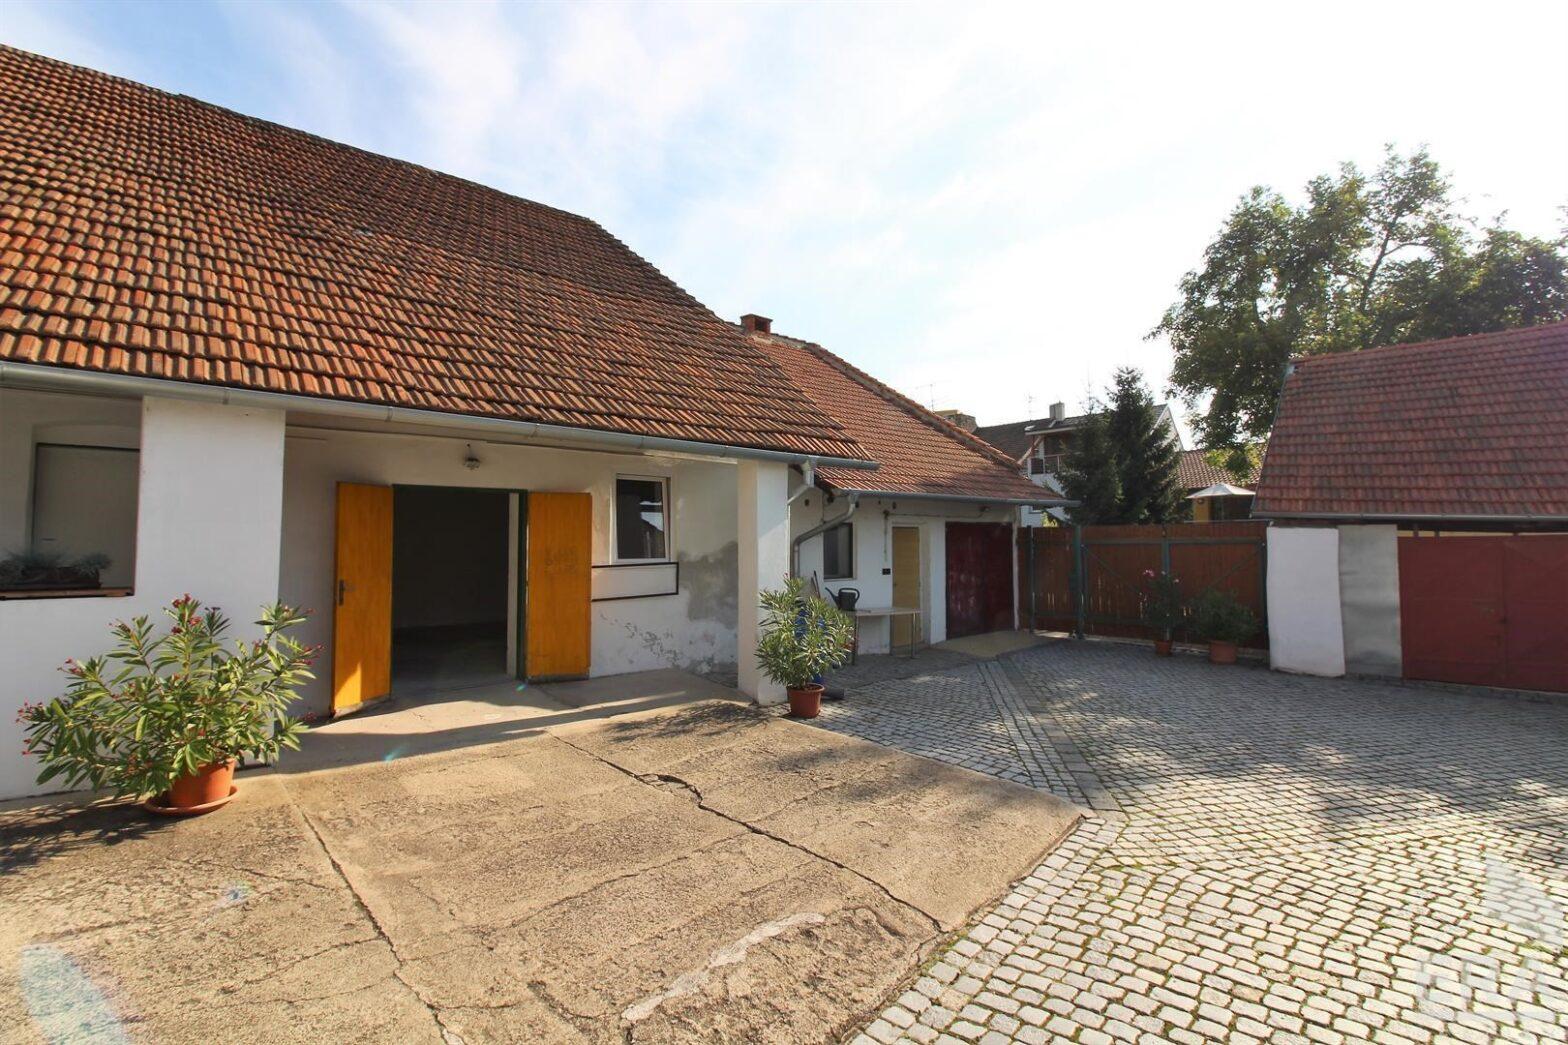 Pronájem skladového prostoru 61m², Maničky 4, Brno – Žabovřesky